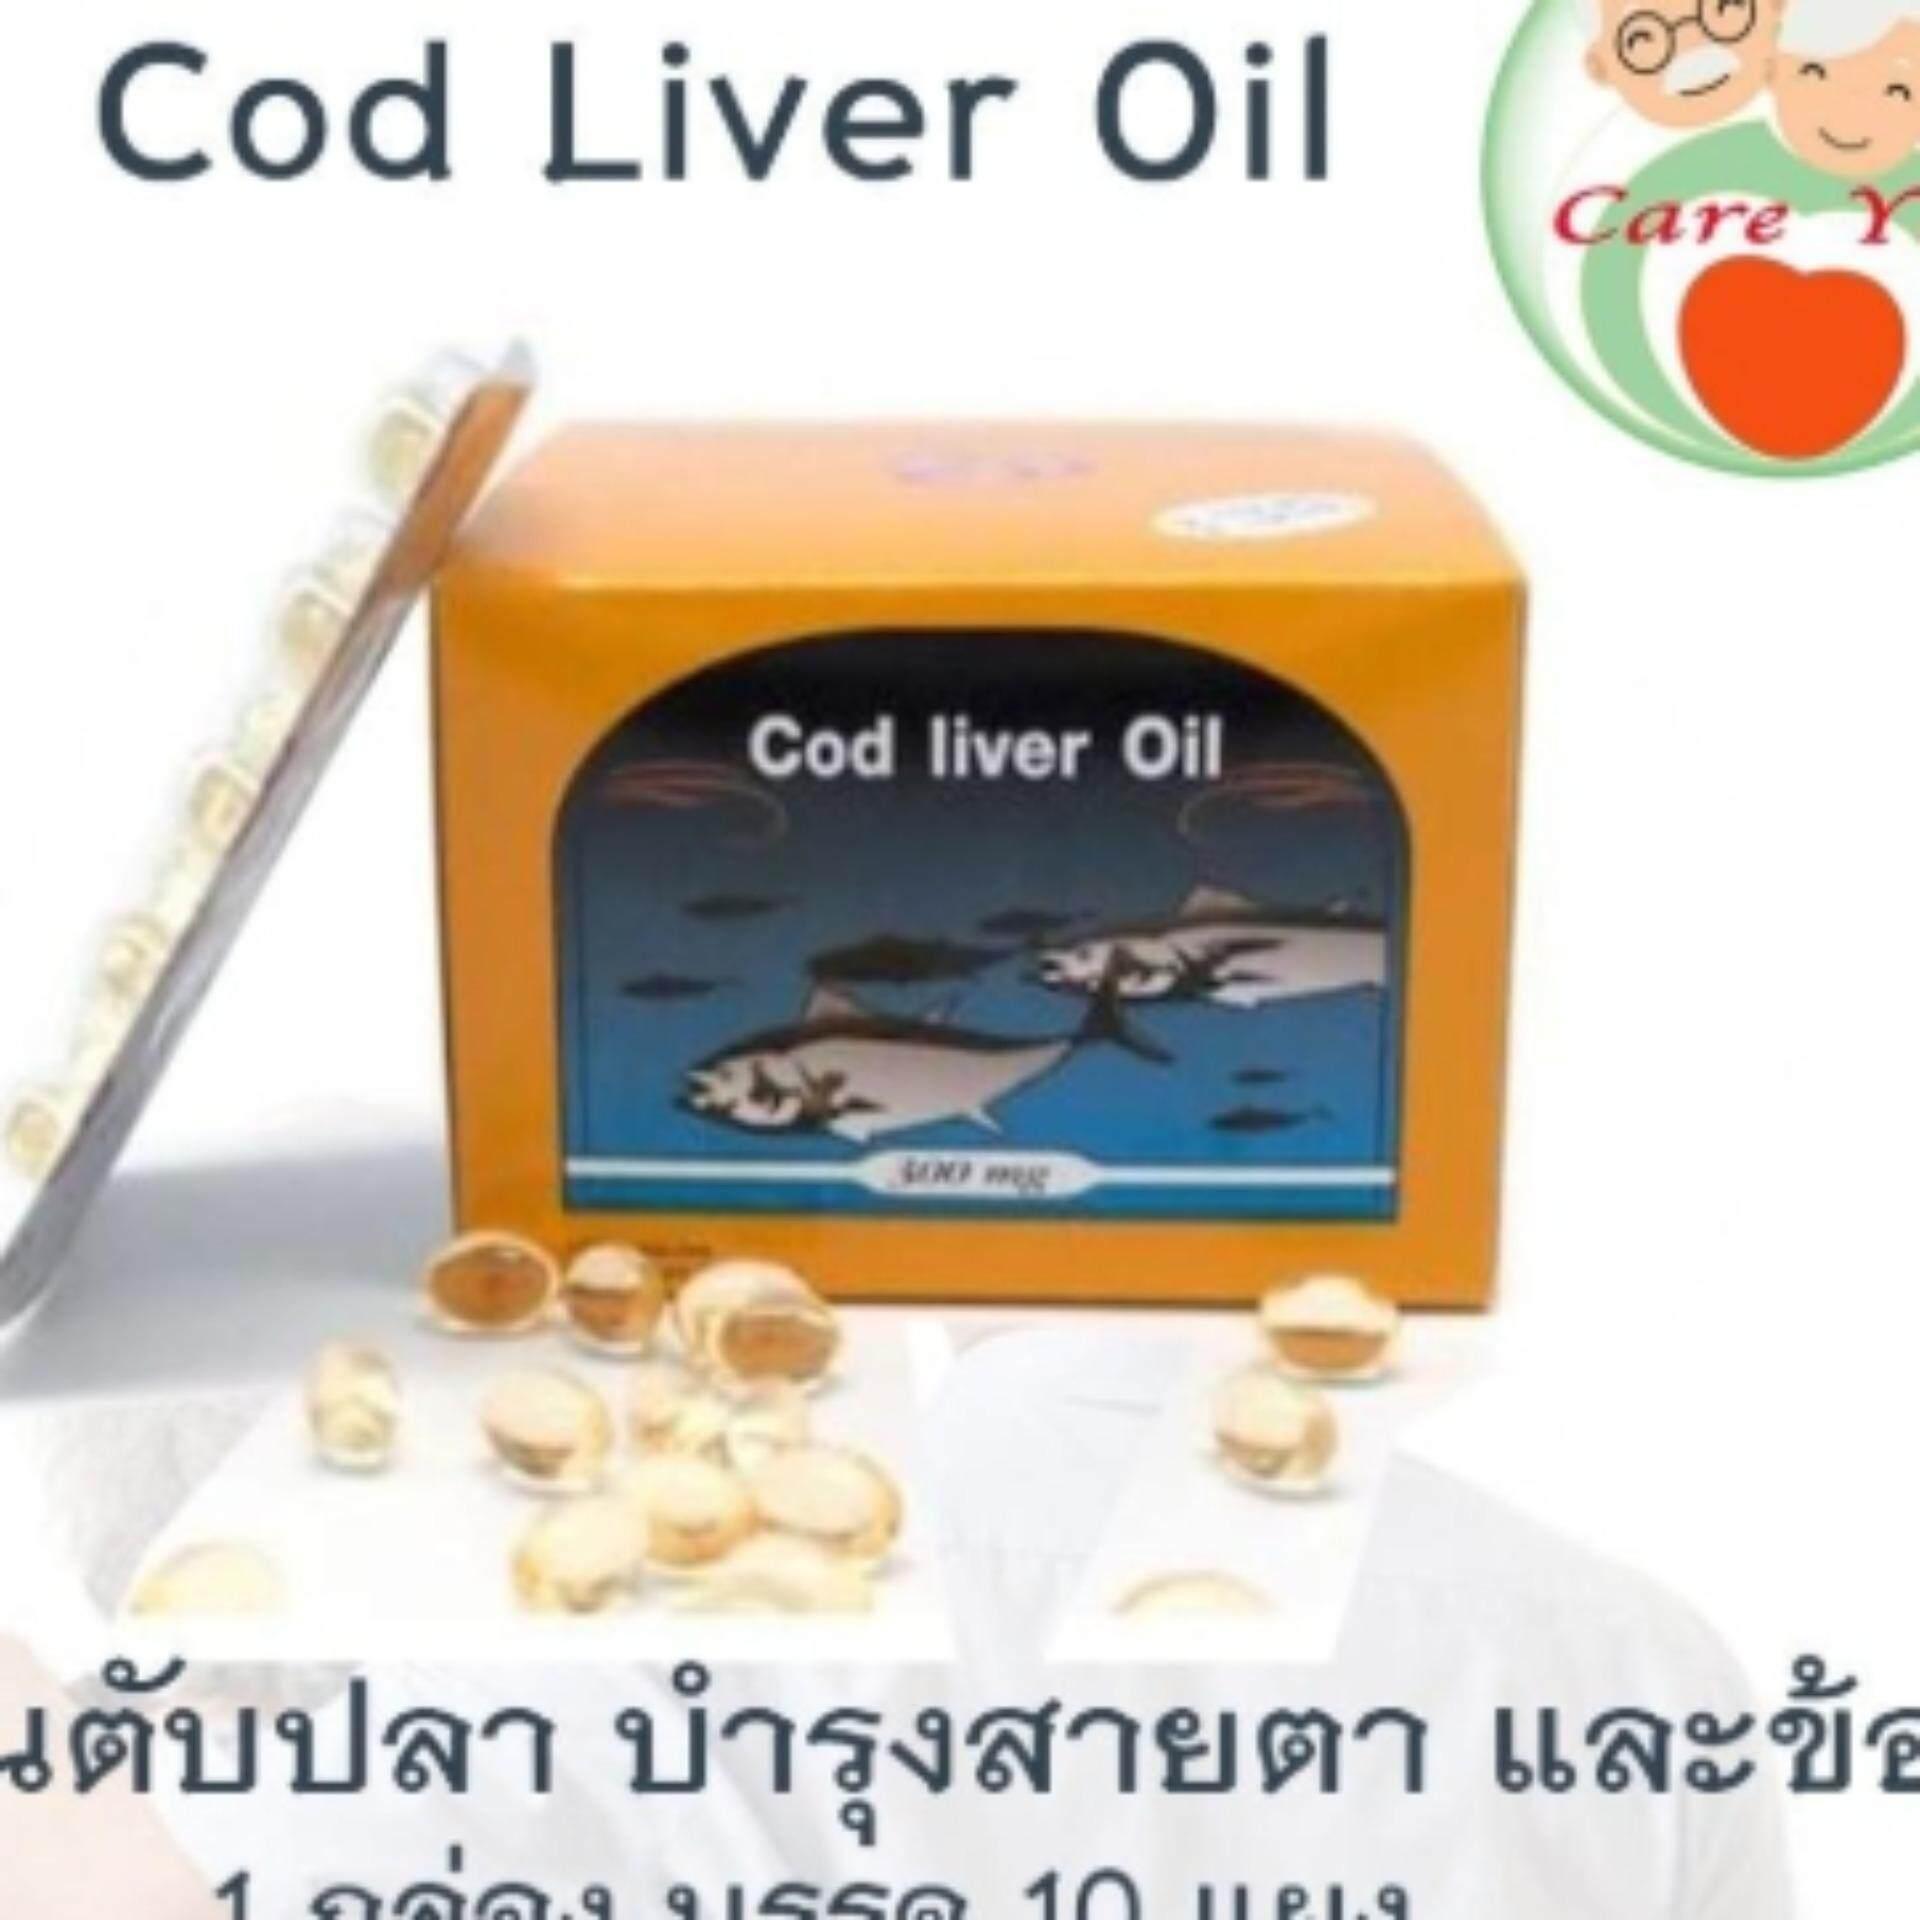 Cod Liver Oil High Source Of Omega-3 Vitamin E น้ํามันตับปลา พรีเวนทีฟ ไลฟ์ ขนาด 100 เม็ด ( 1 กล่อง บรรจุ 10 แผง ).